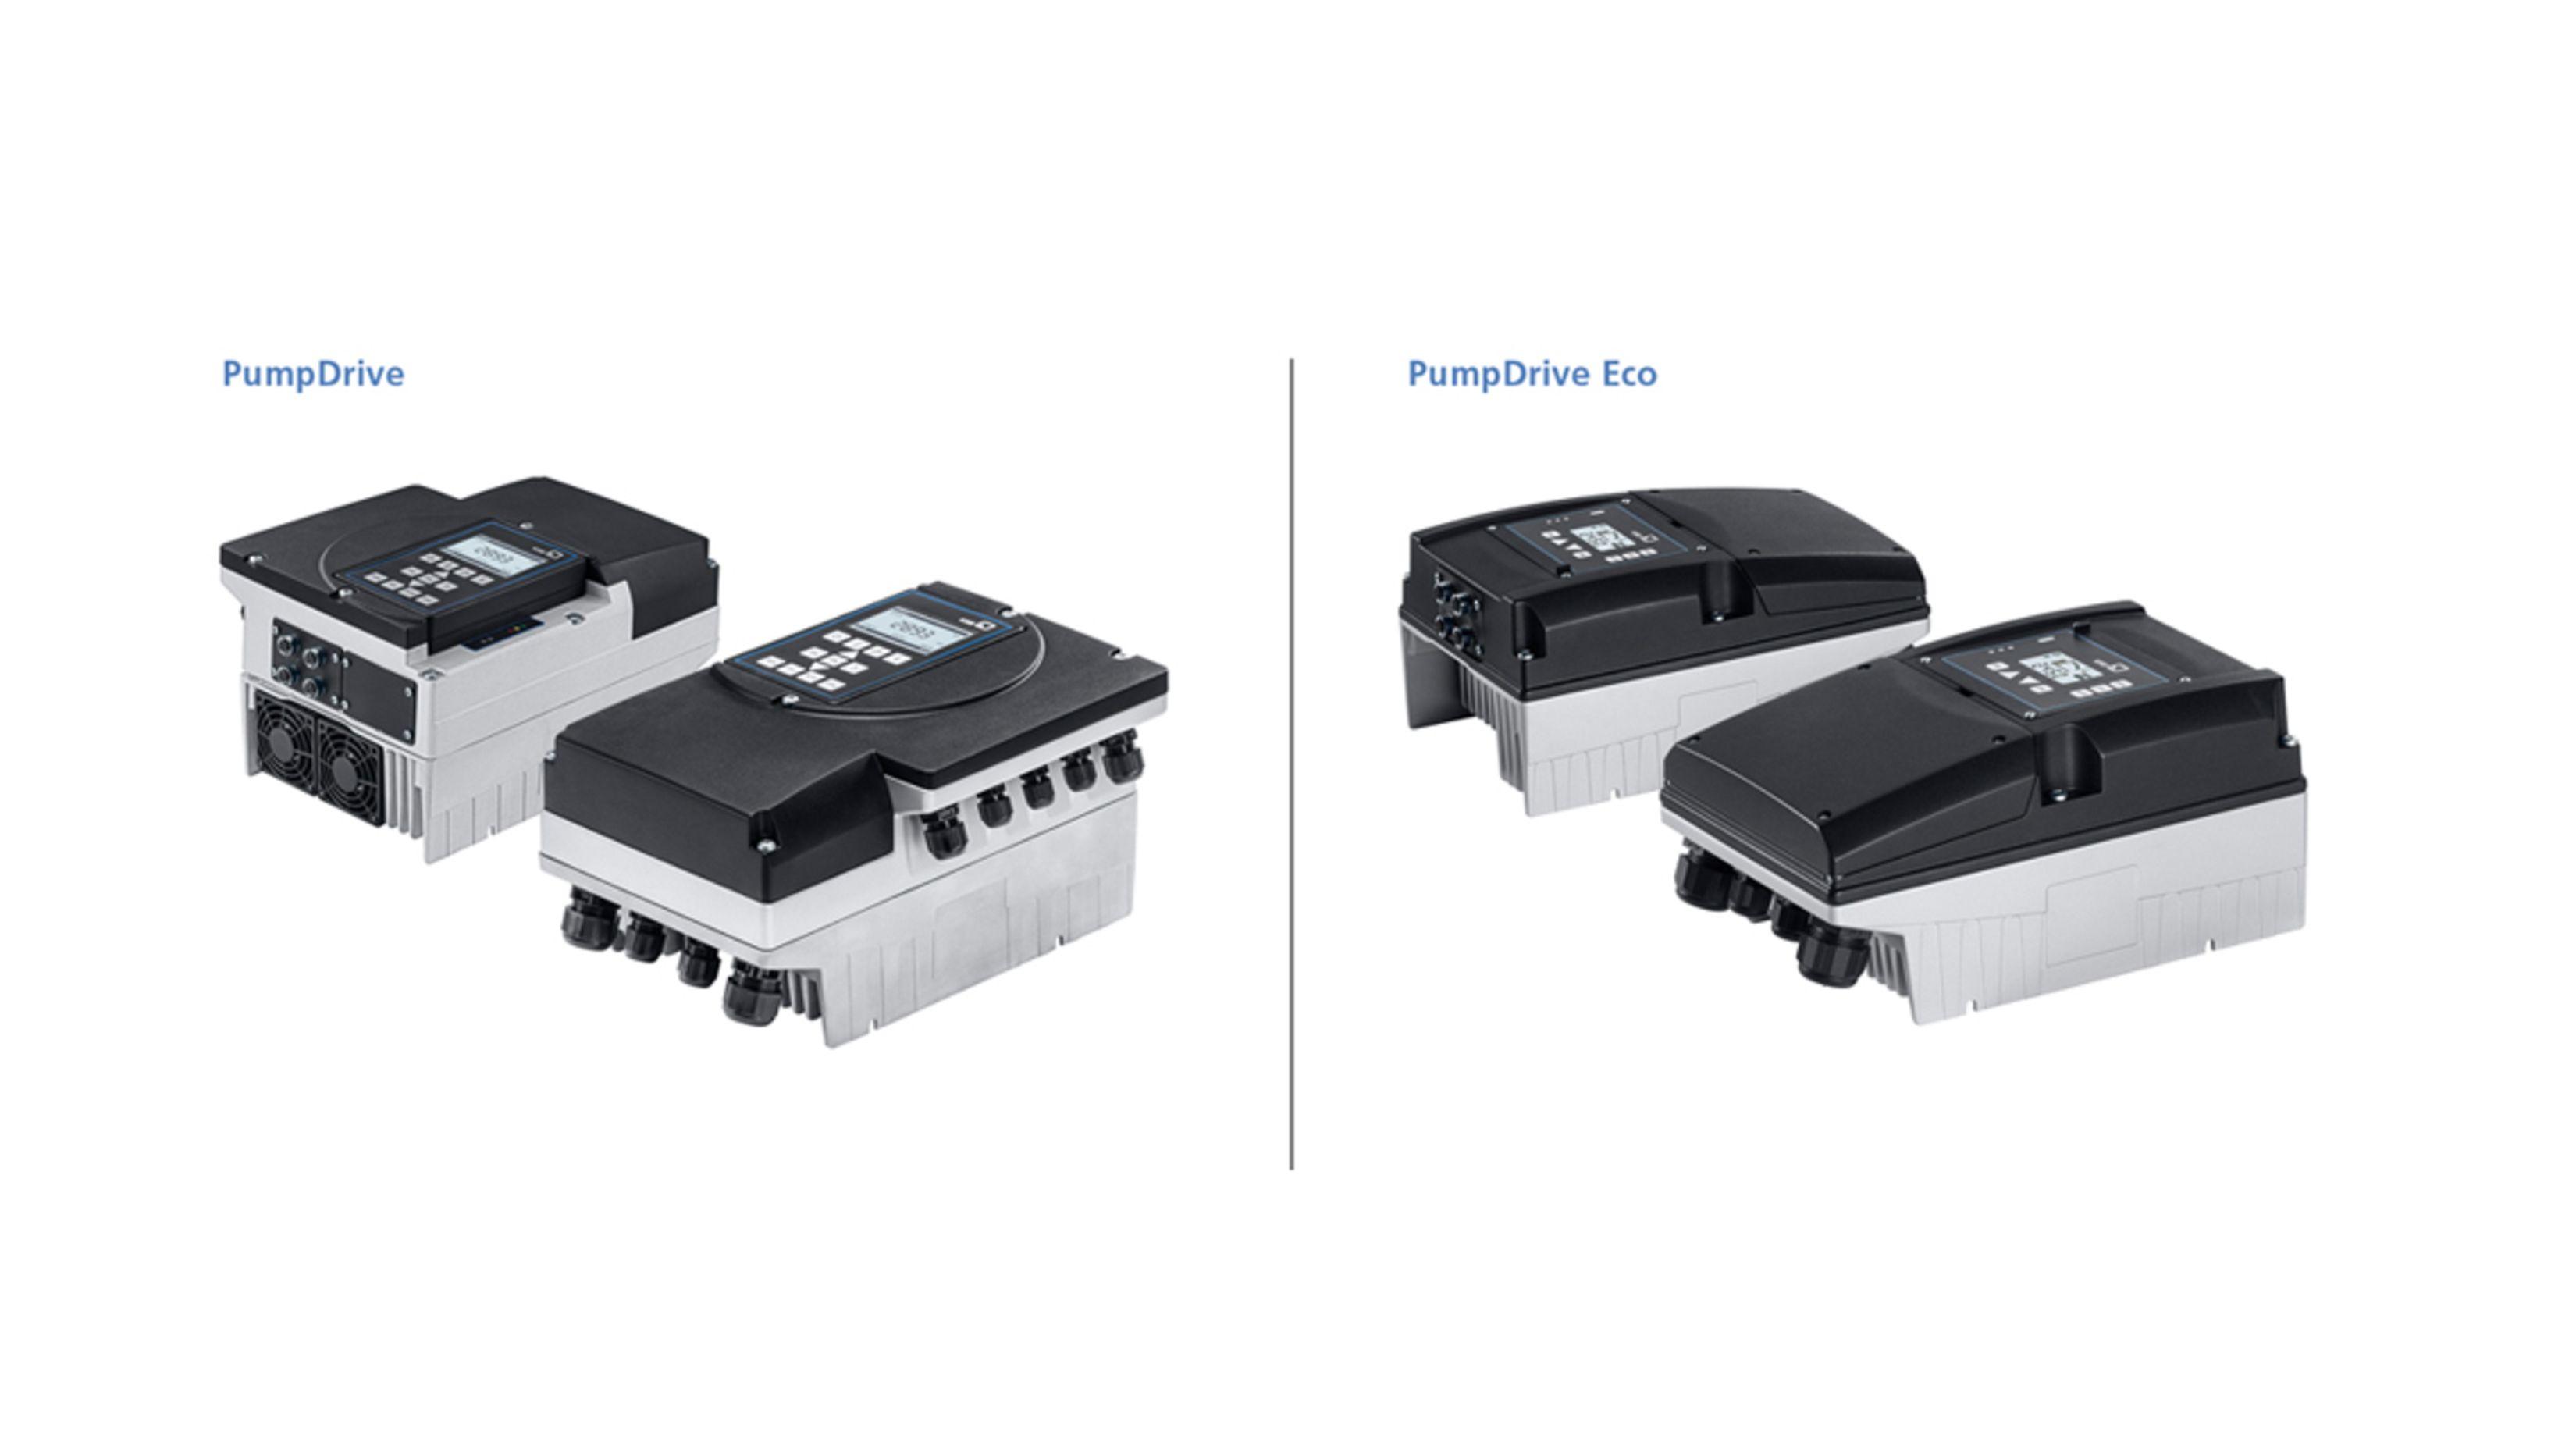 Versions PumpDrive et PumpDrive Eco